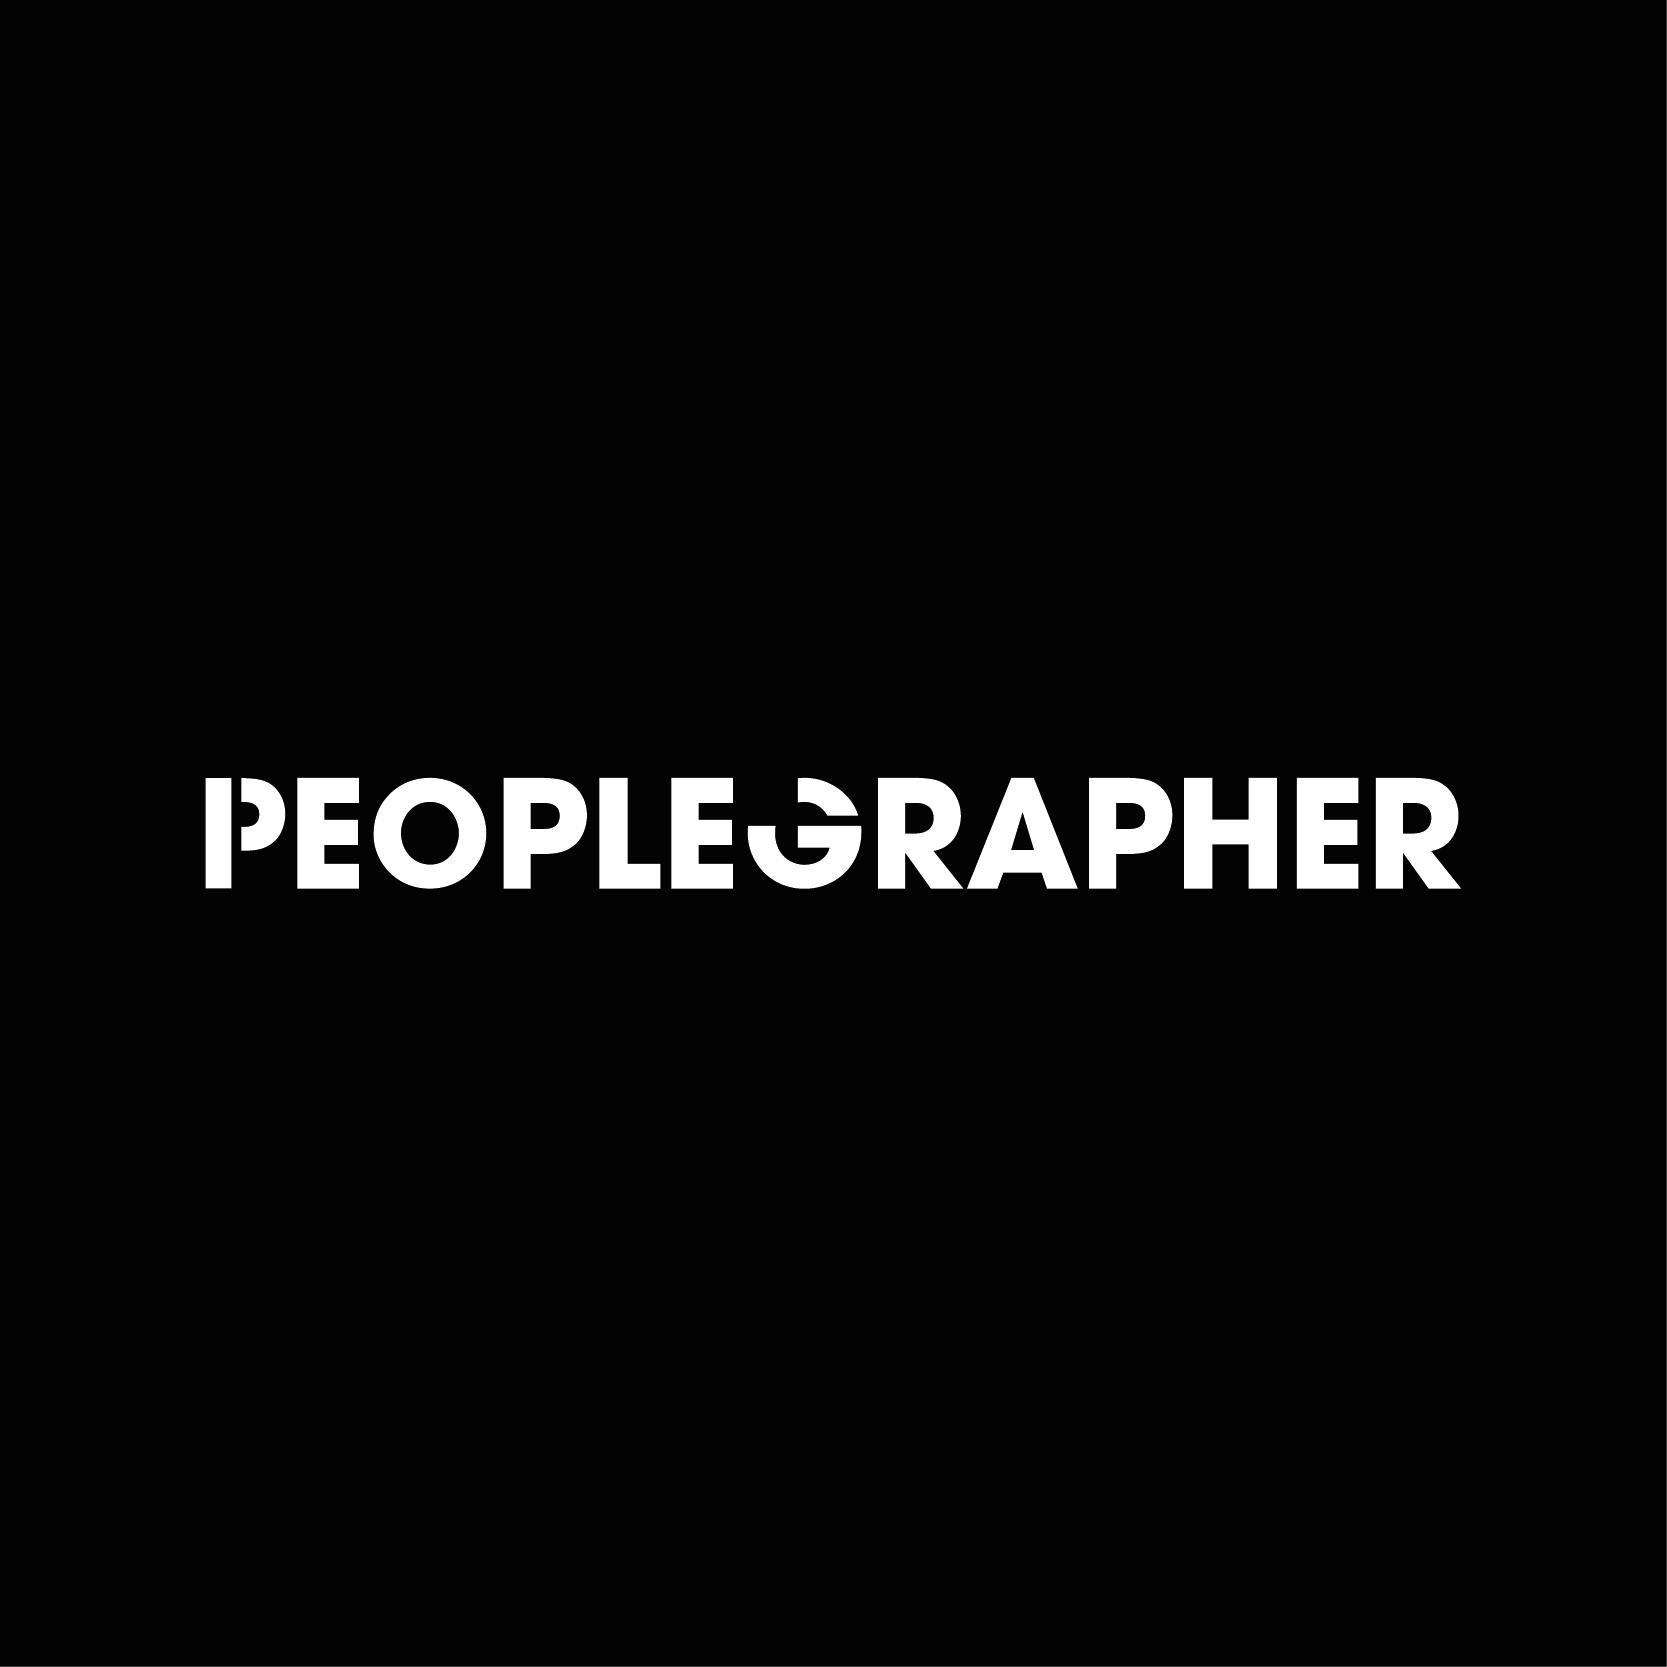 peoplegrapher